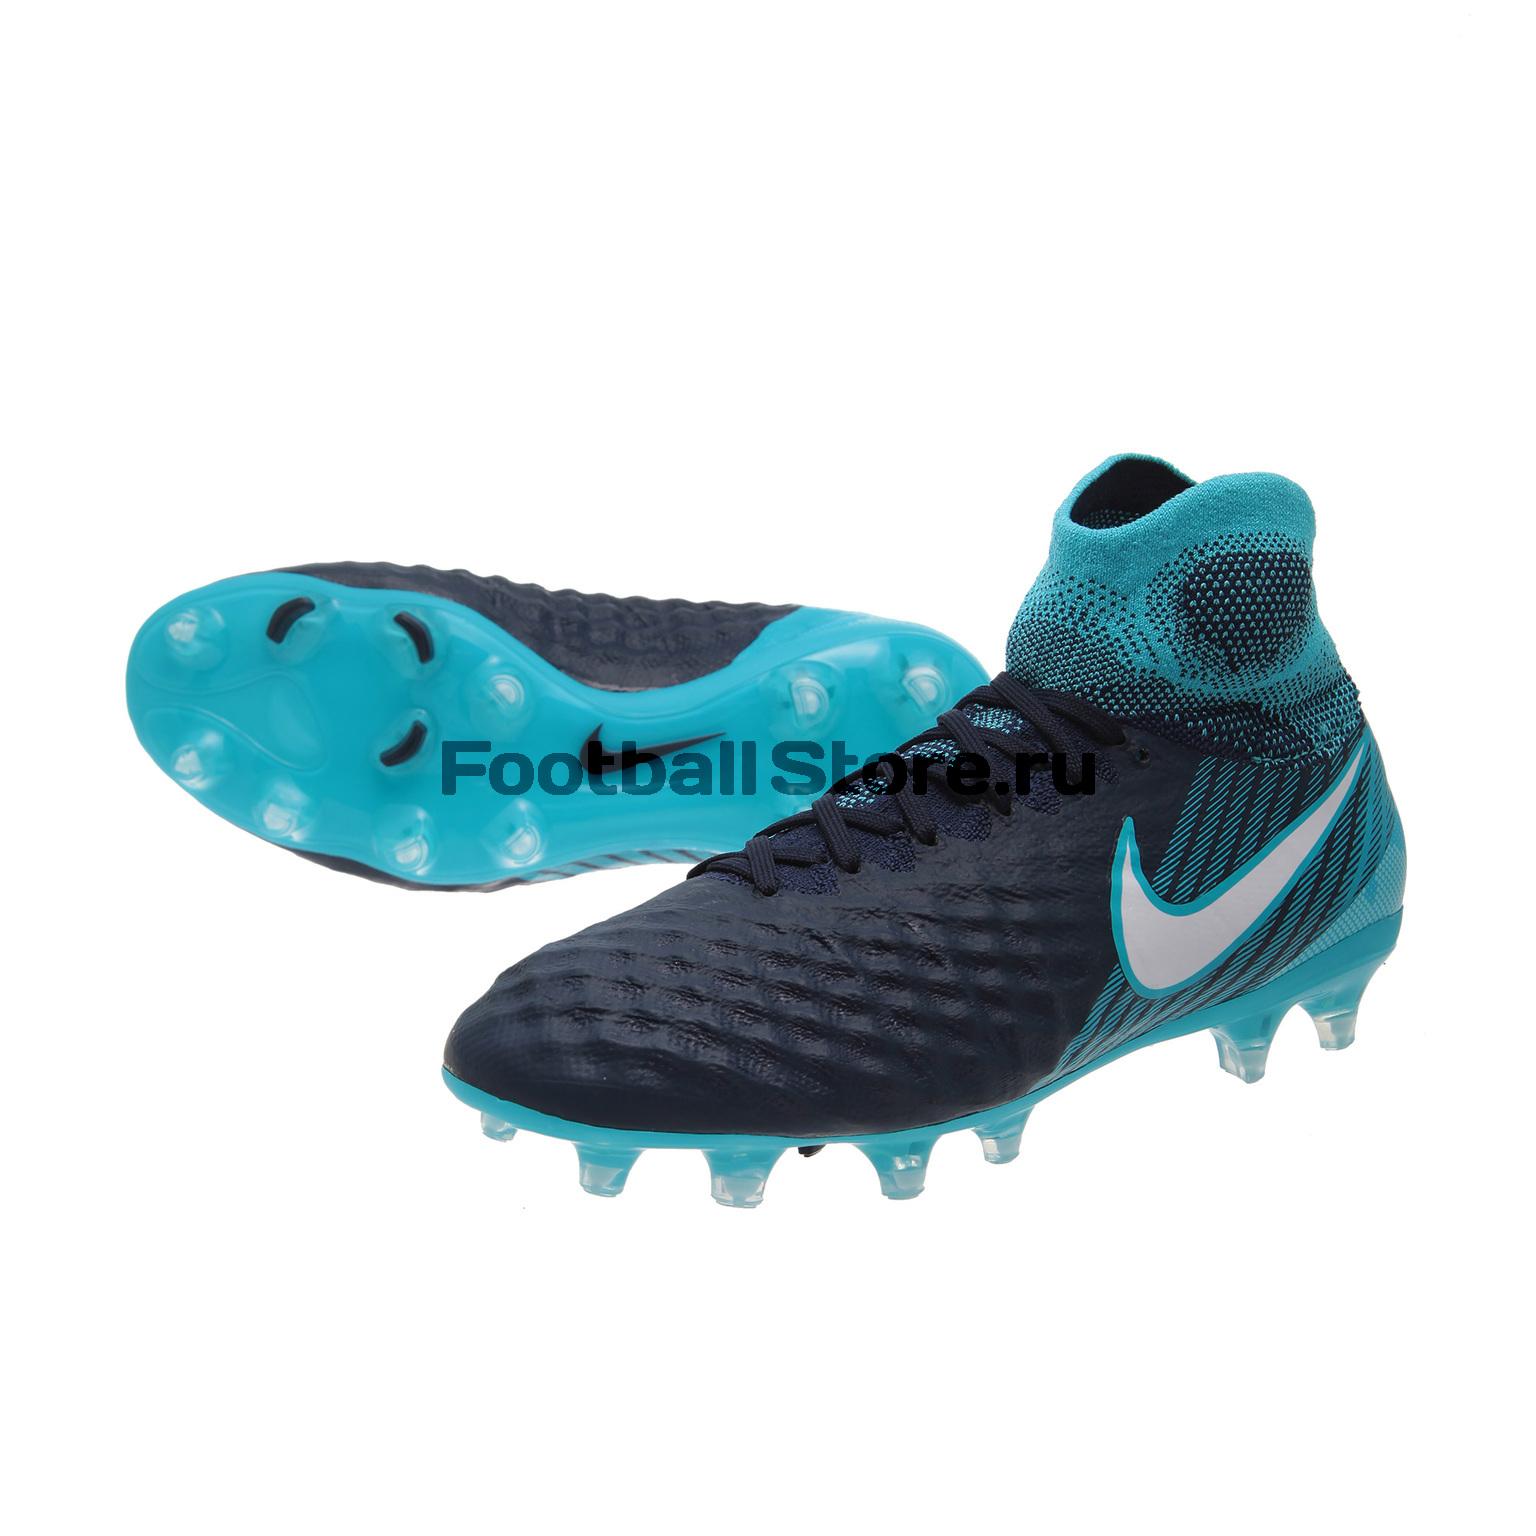 Детские бутсы Nike Бутсы Nike Magista Obra II FG JR 844410-414